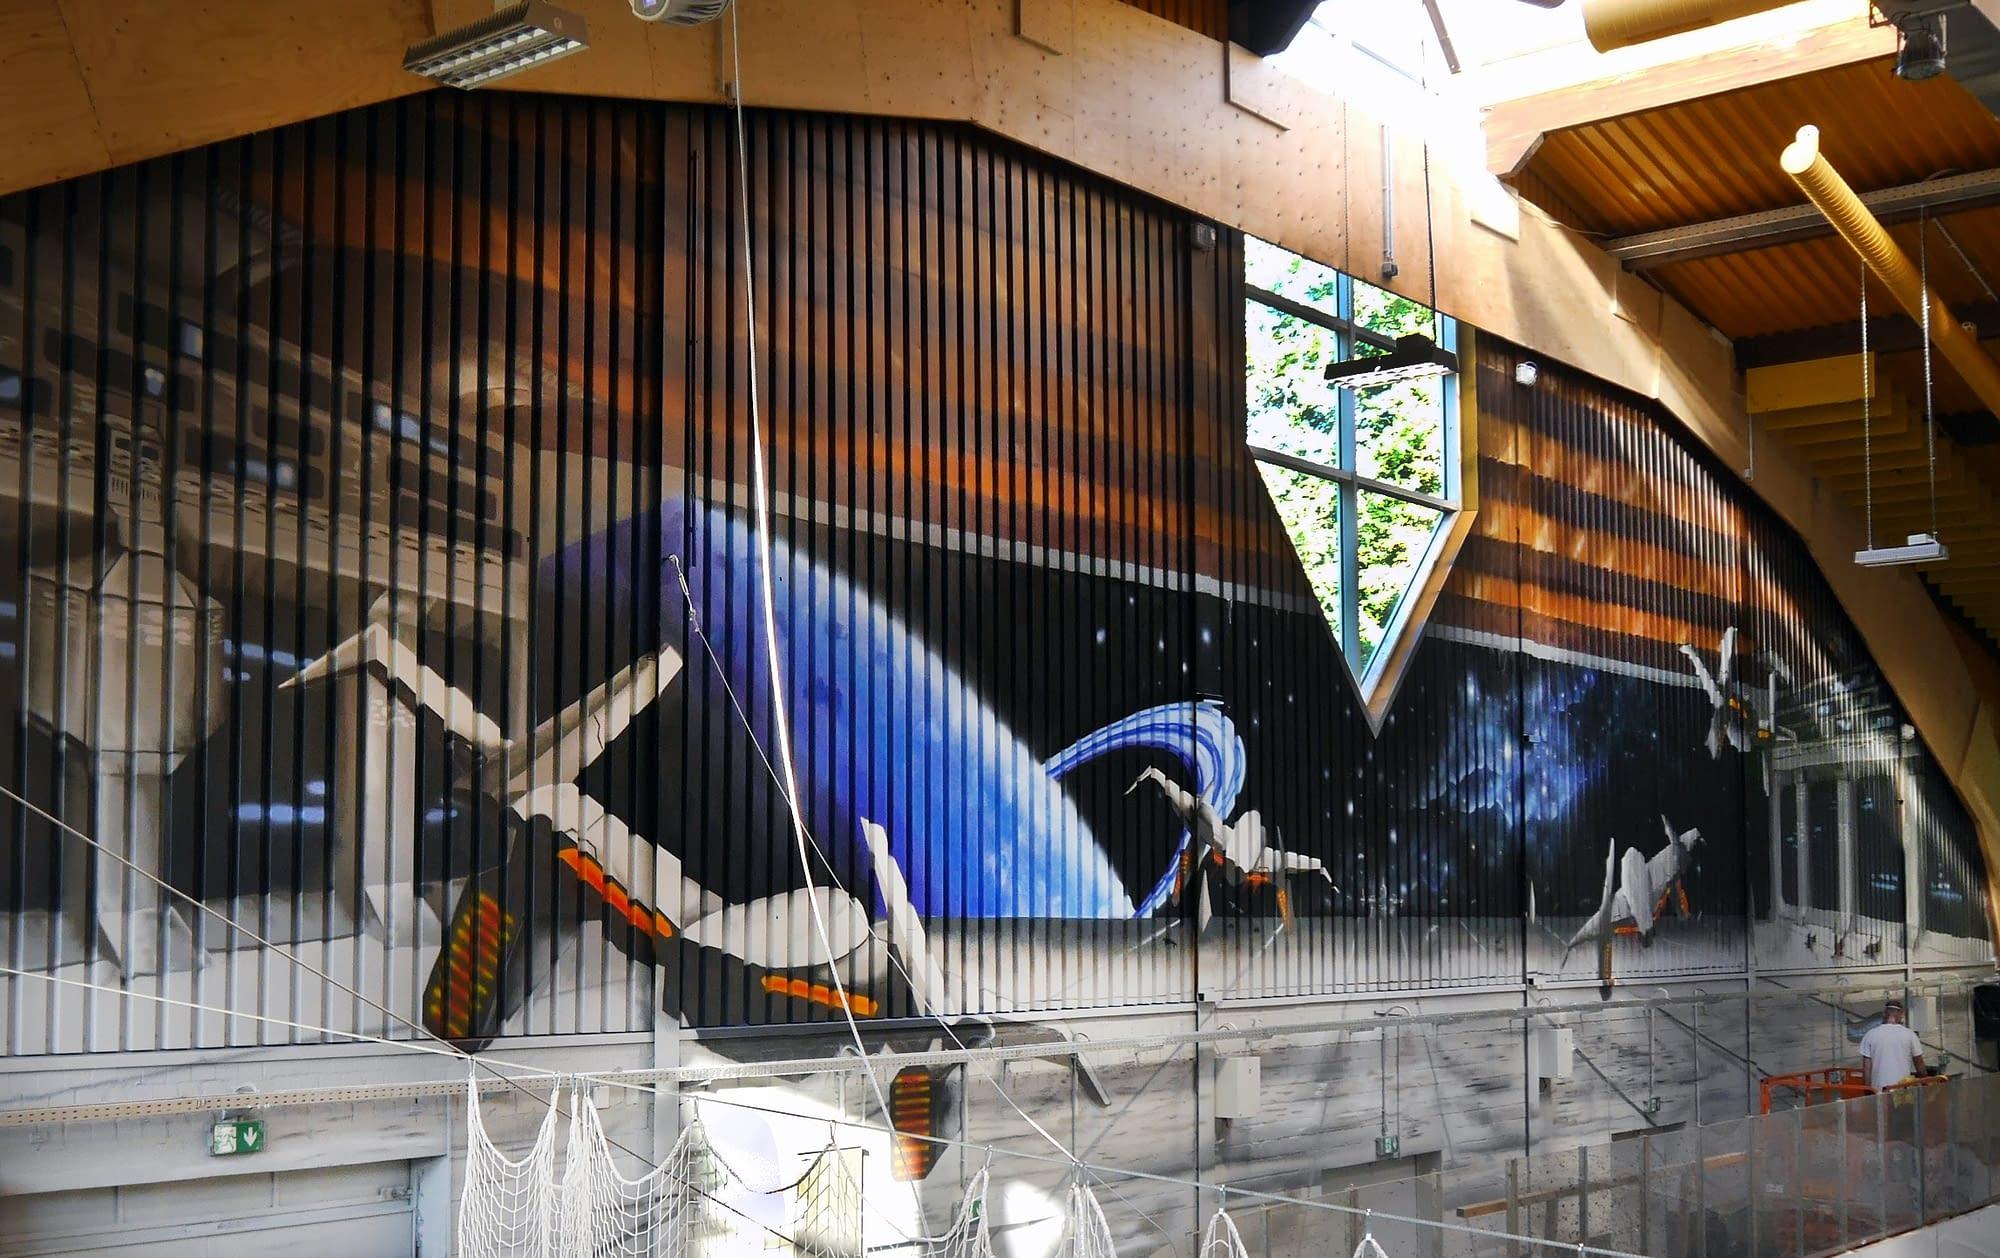 Eishalle Moers Graffiti